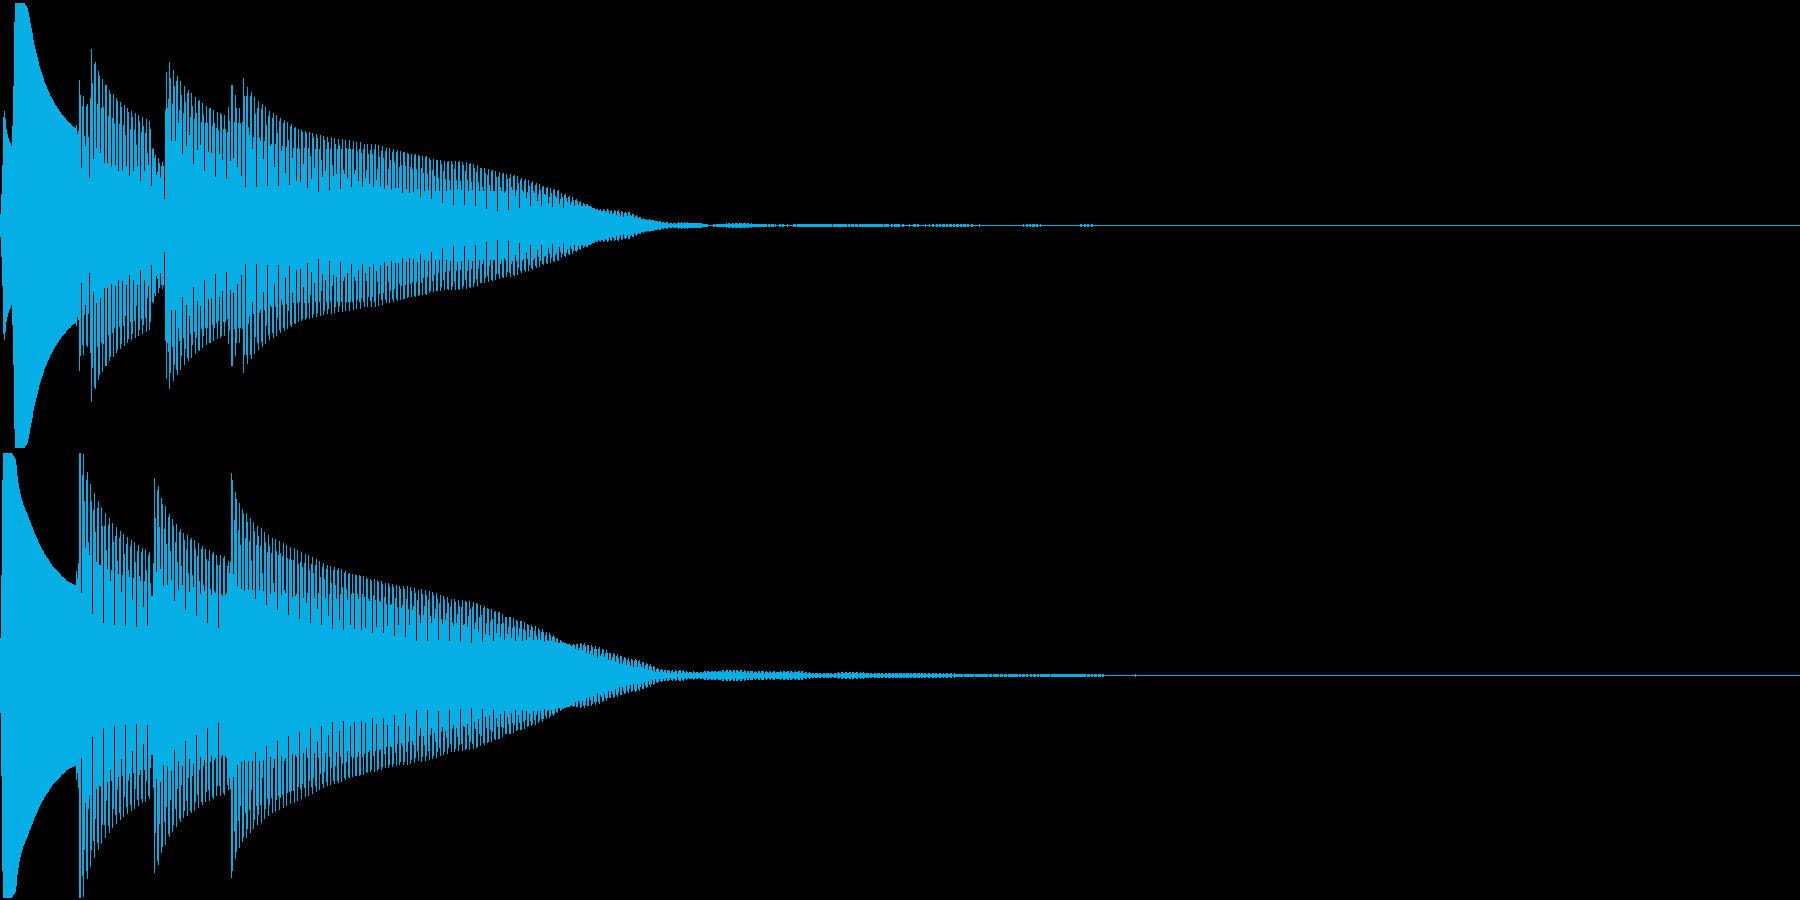 Quiz 正解 ピンポンピンポーン 低音の再生済みの波形